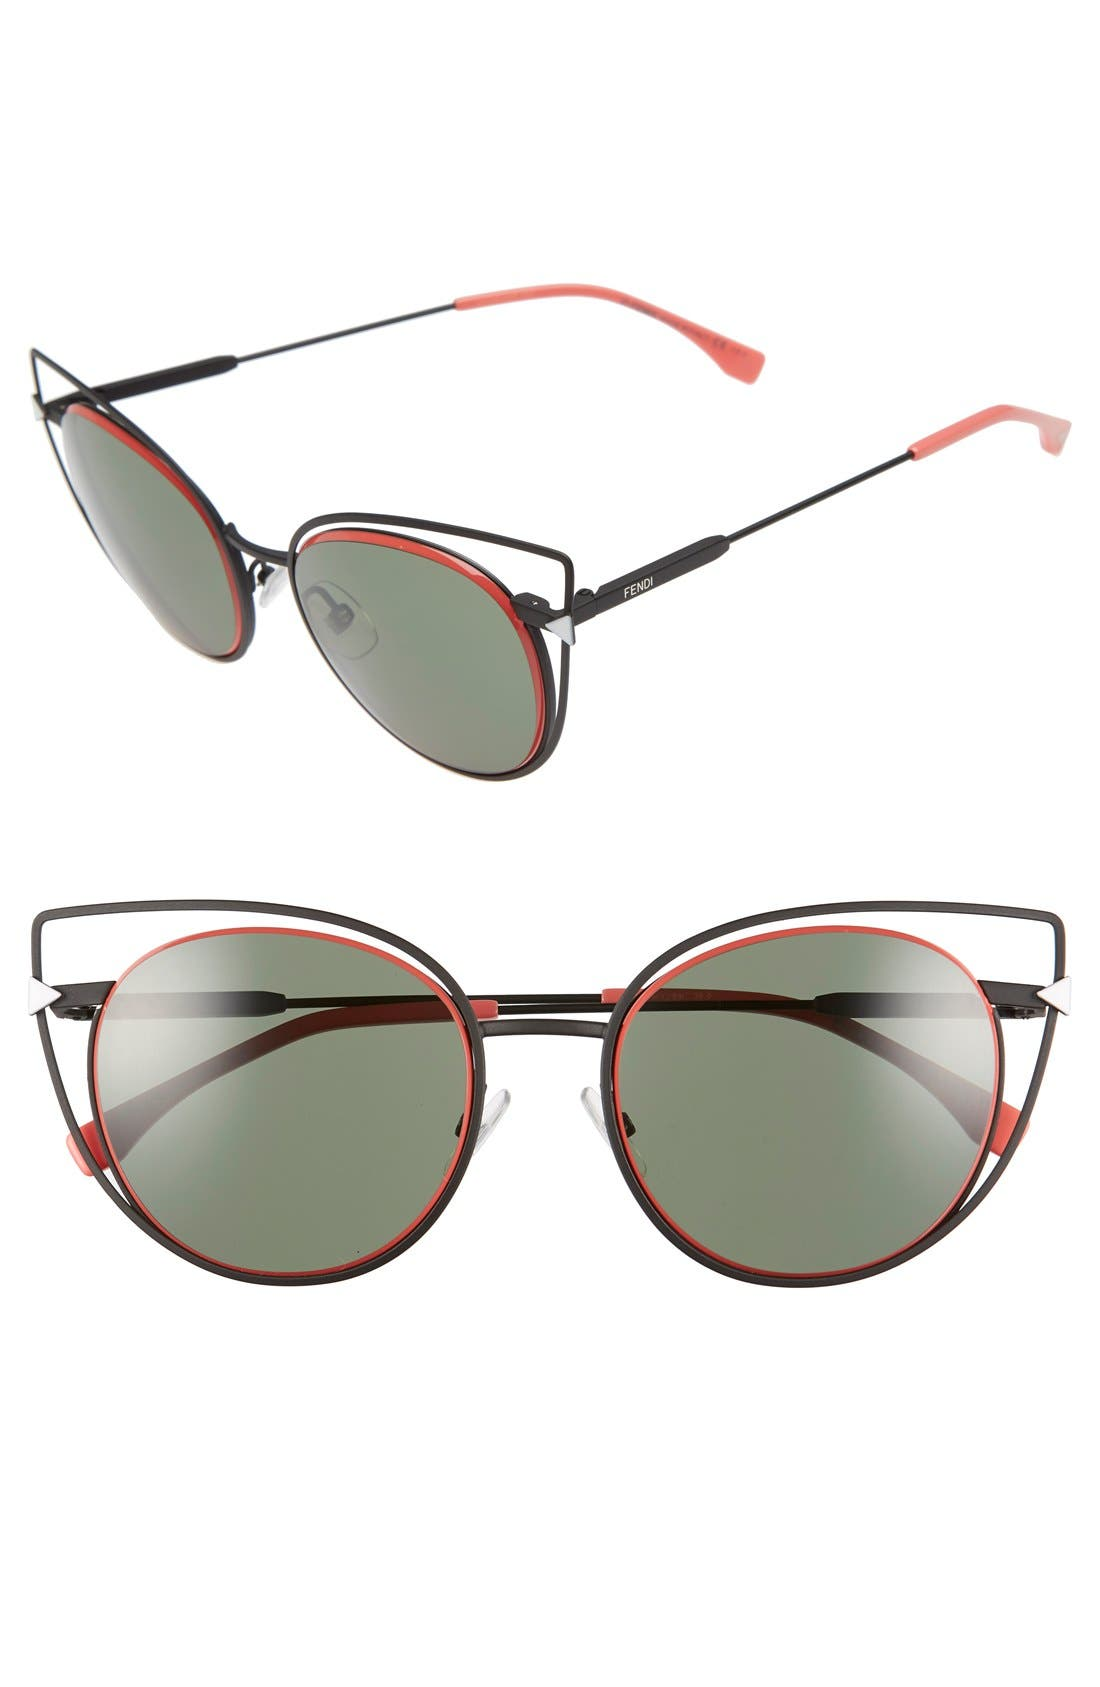 53mm Sunglasses,                         Main,                         color,